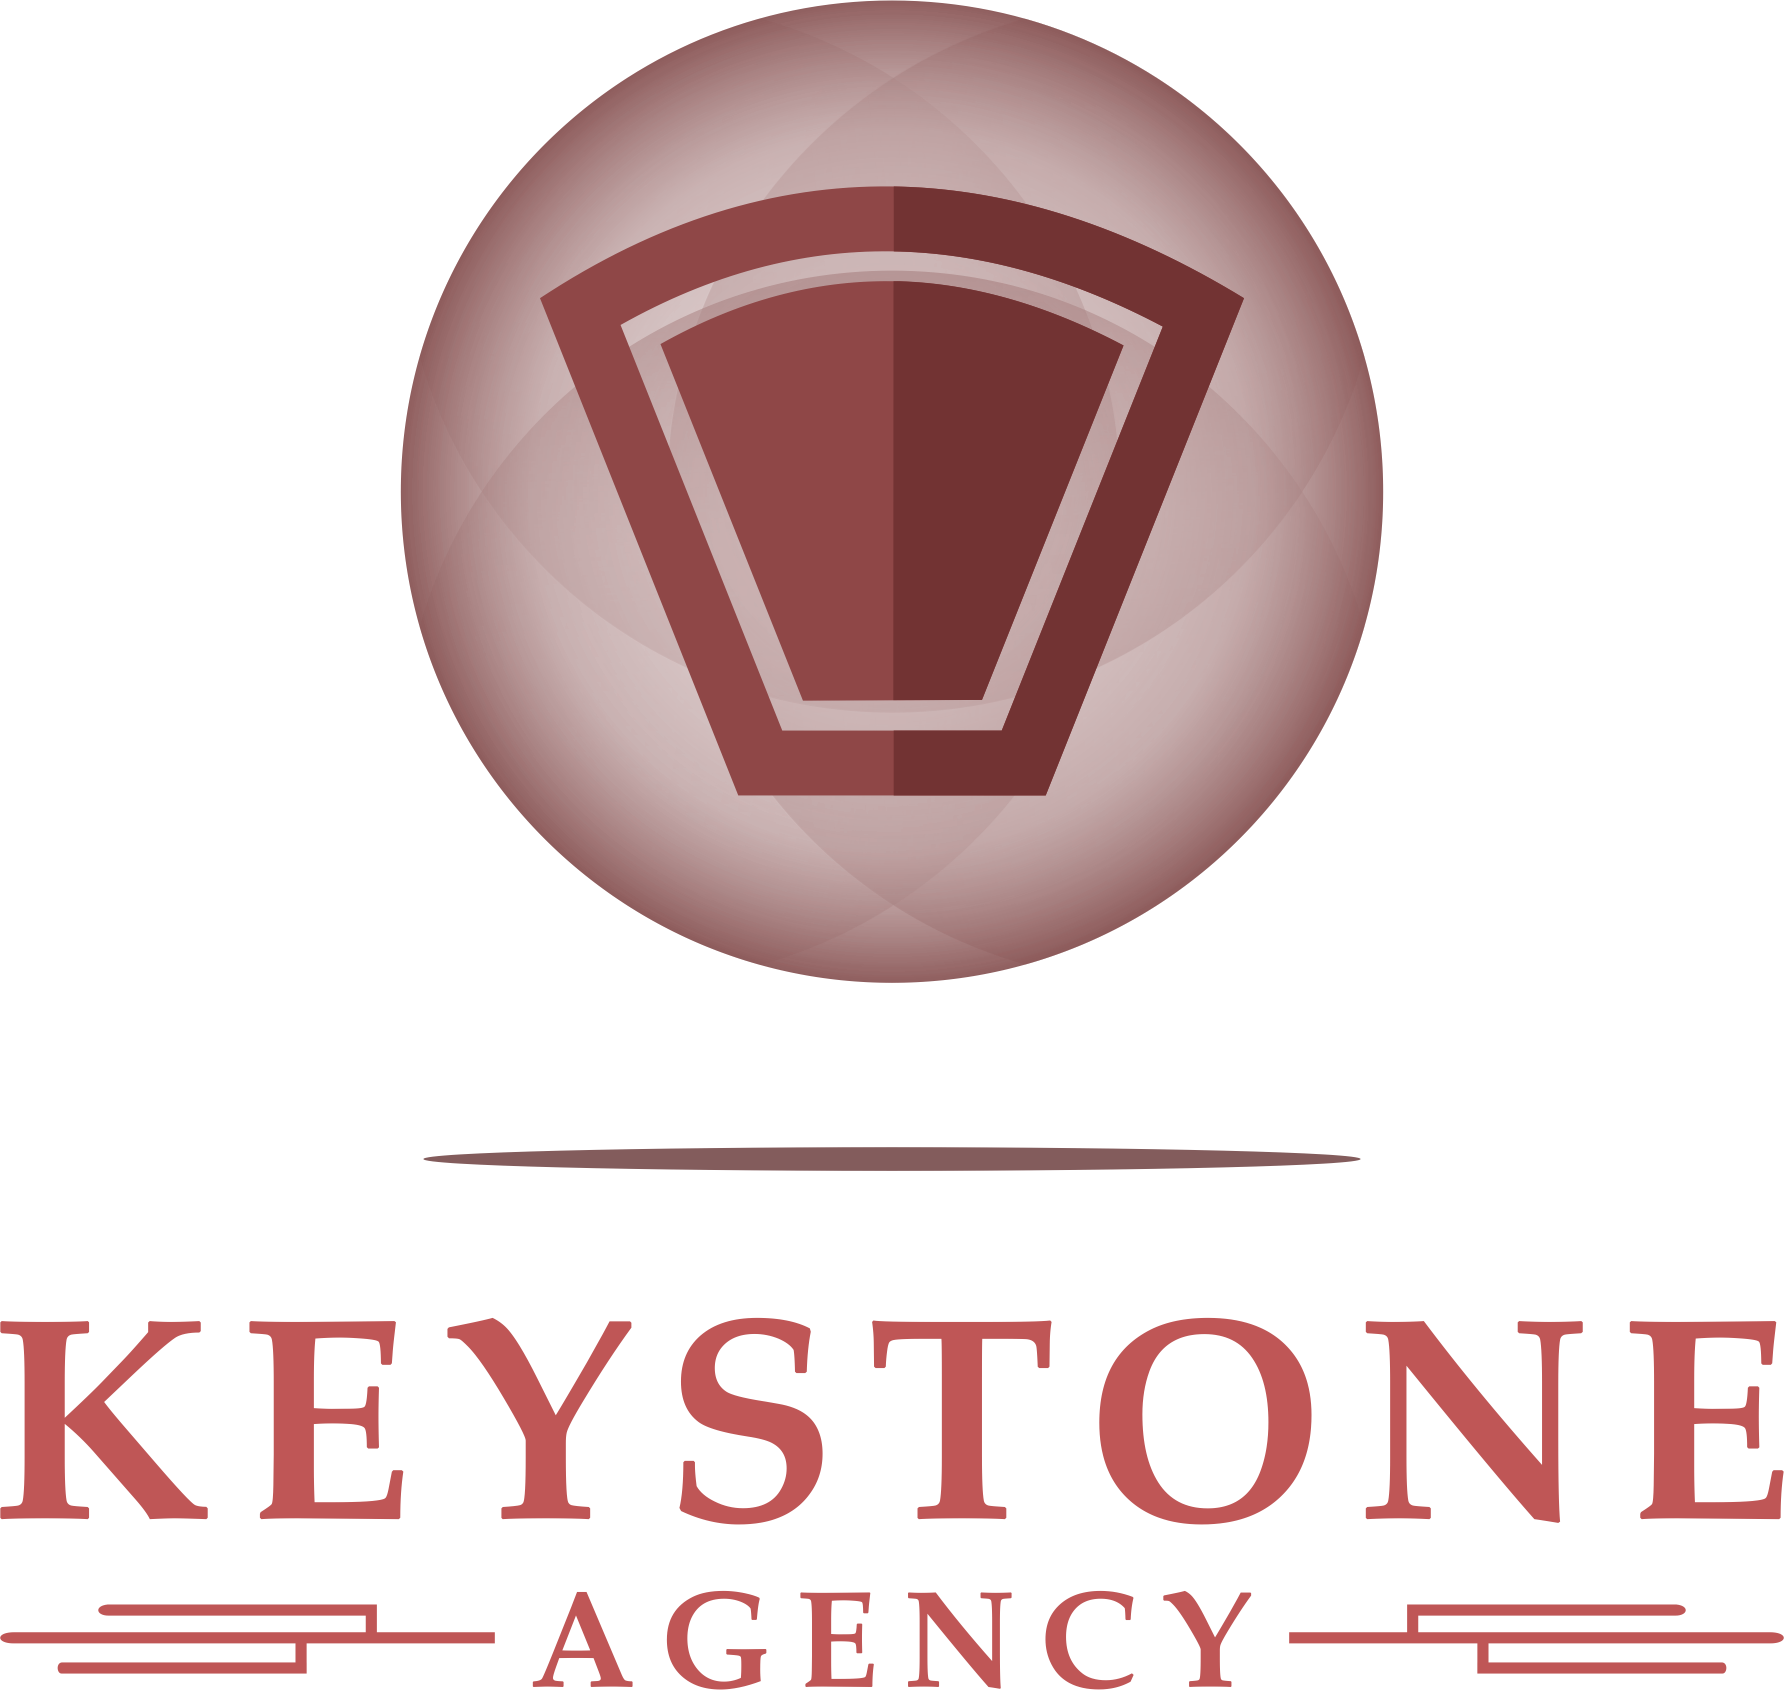 Keystone Agency